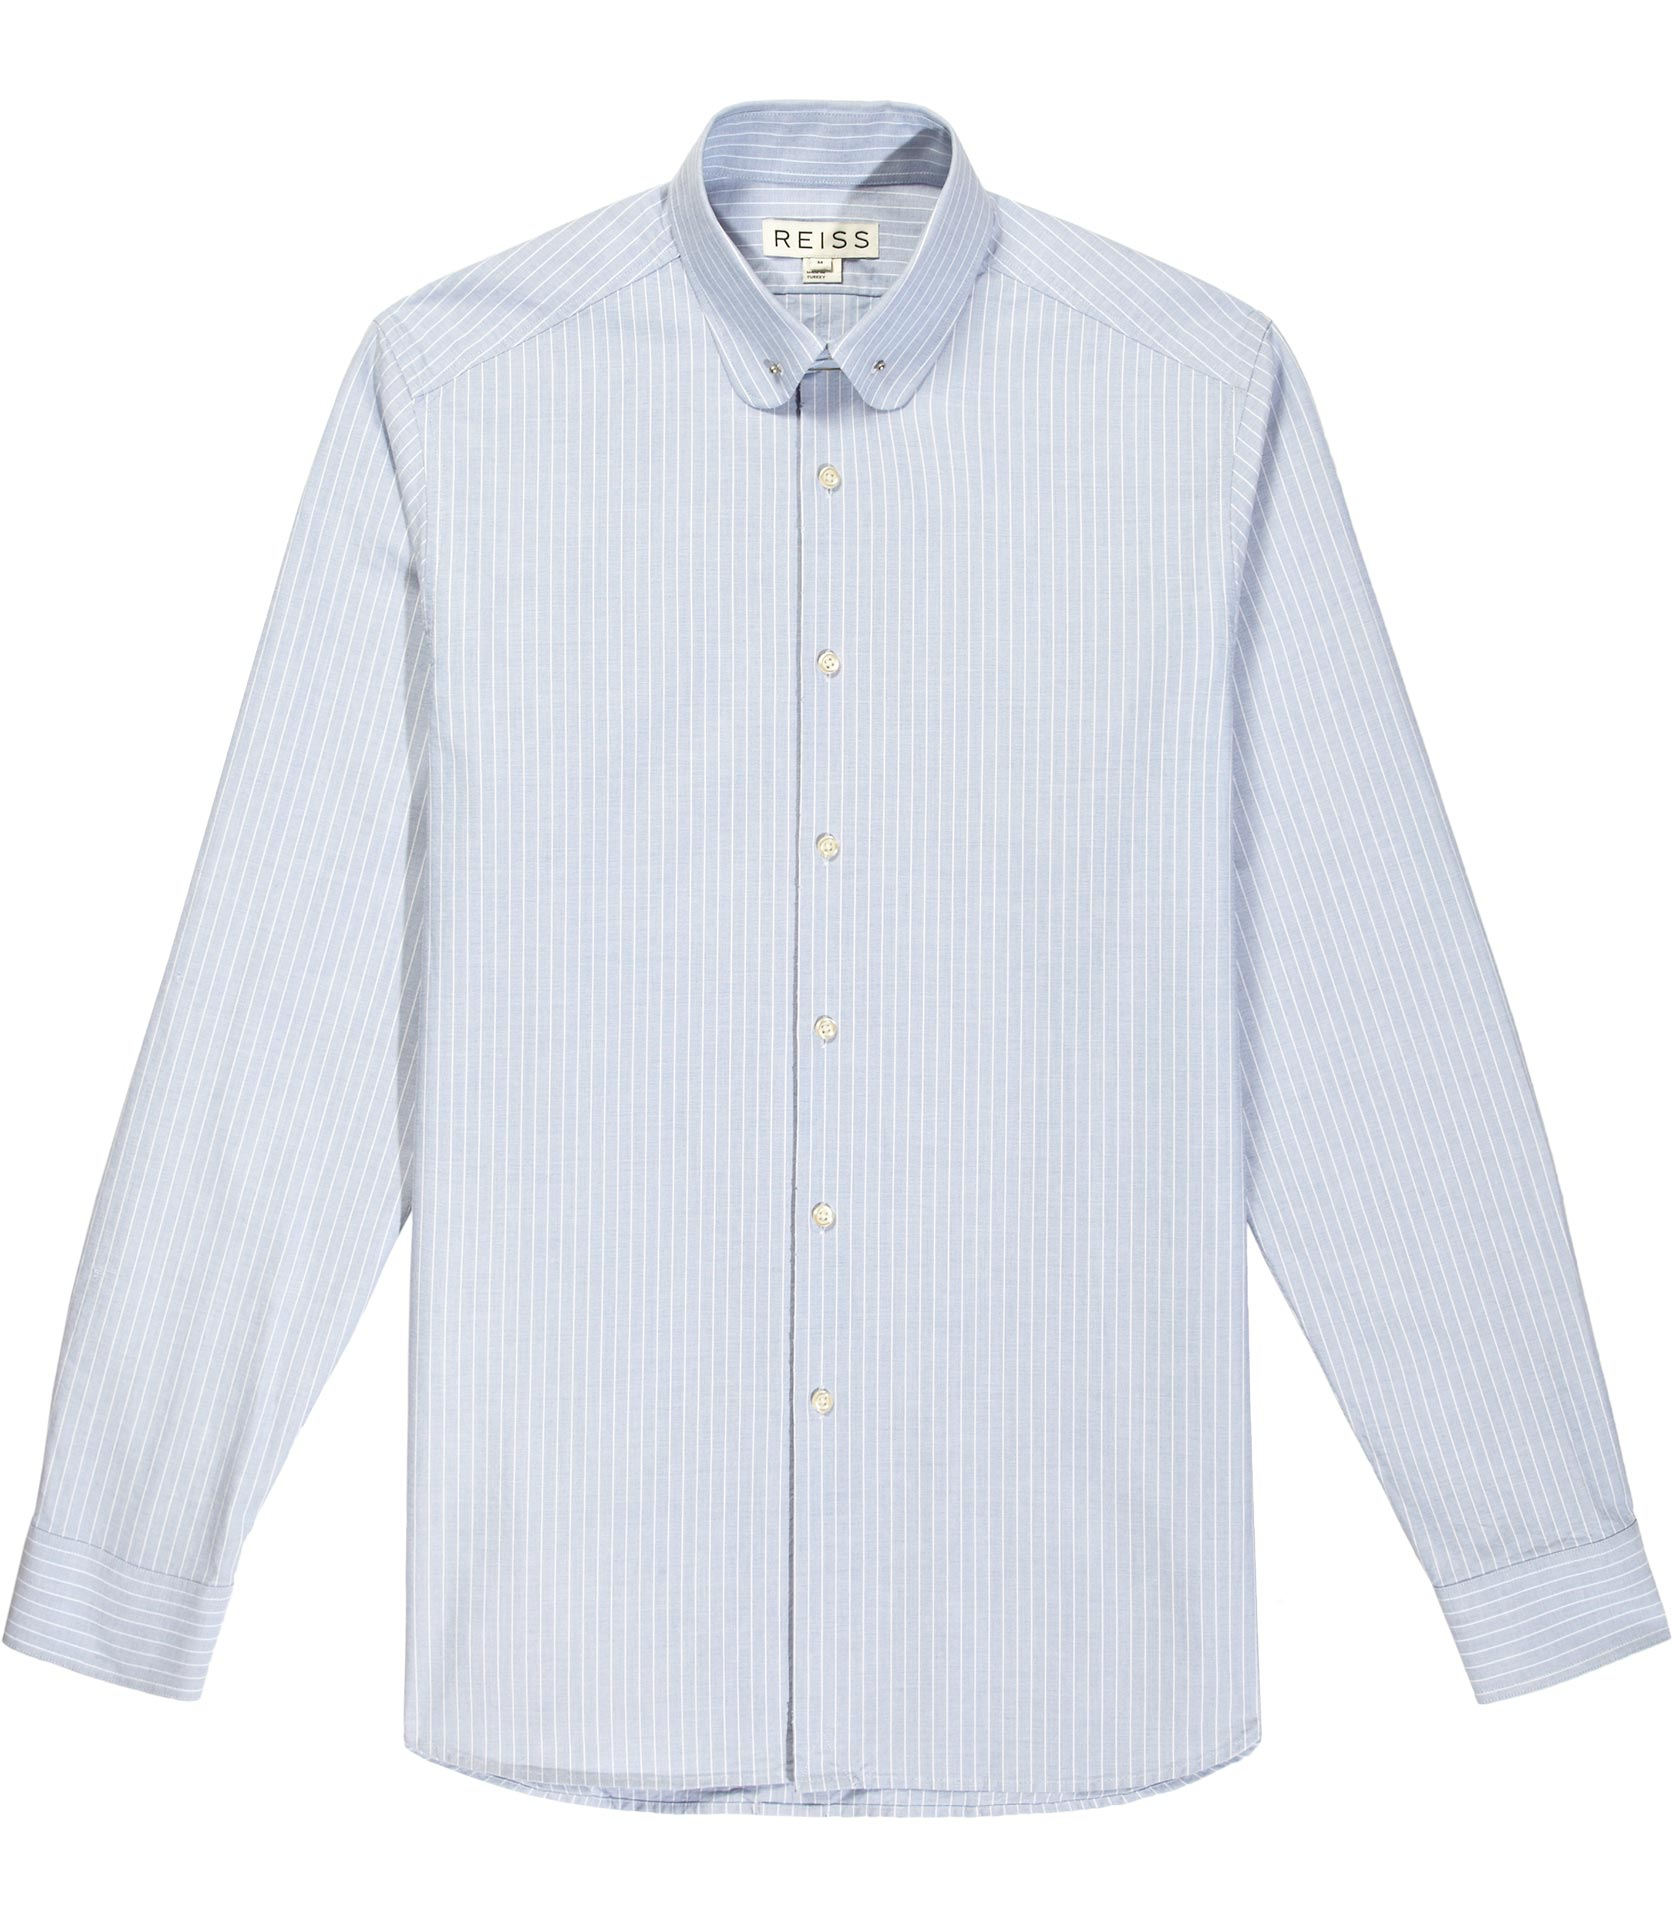 Reiss Wide Stripe Collar Bar Shirt In Blue For Men Lyst